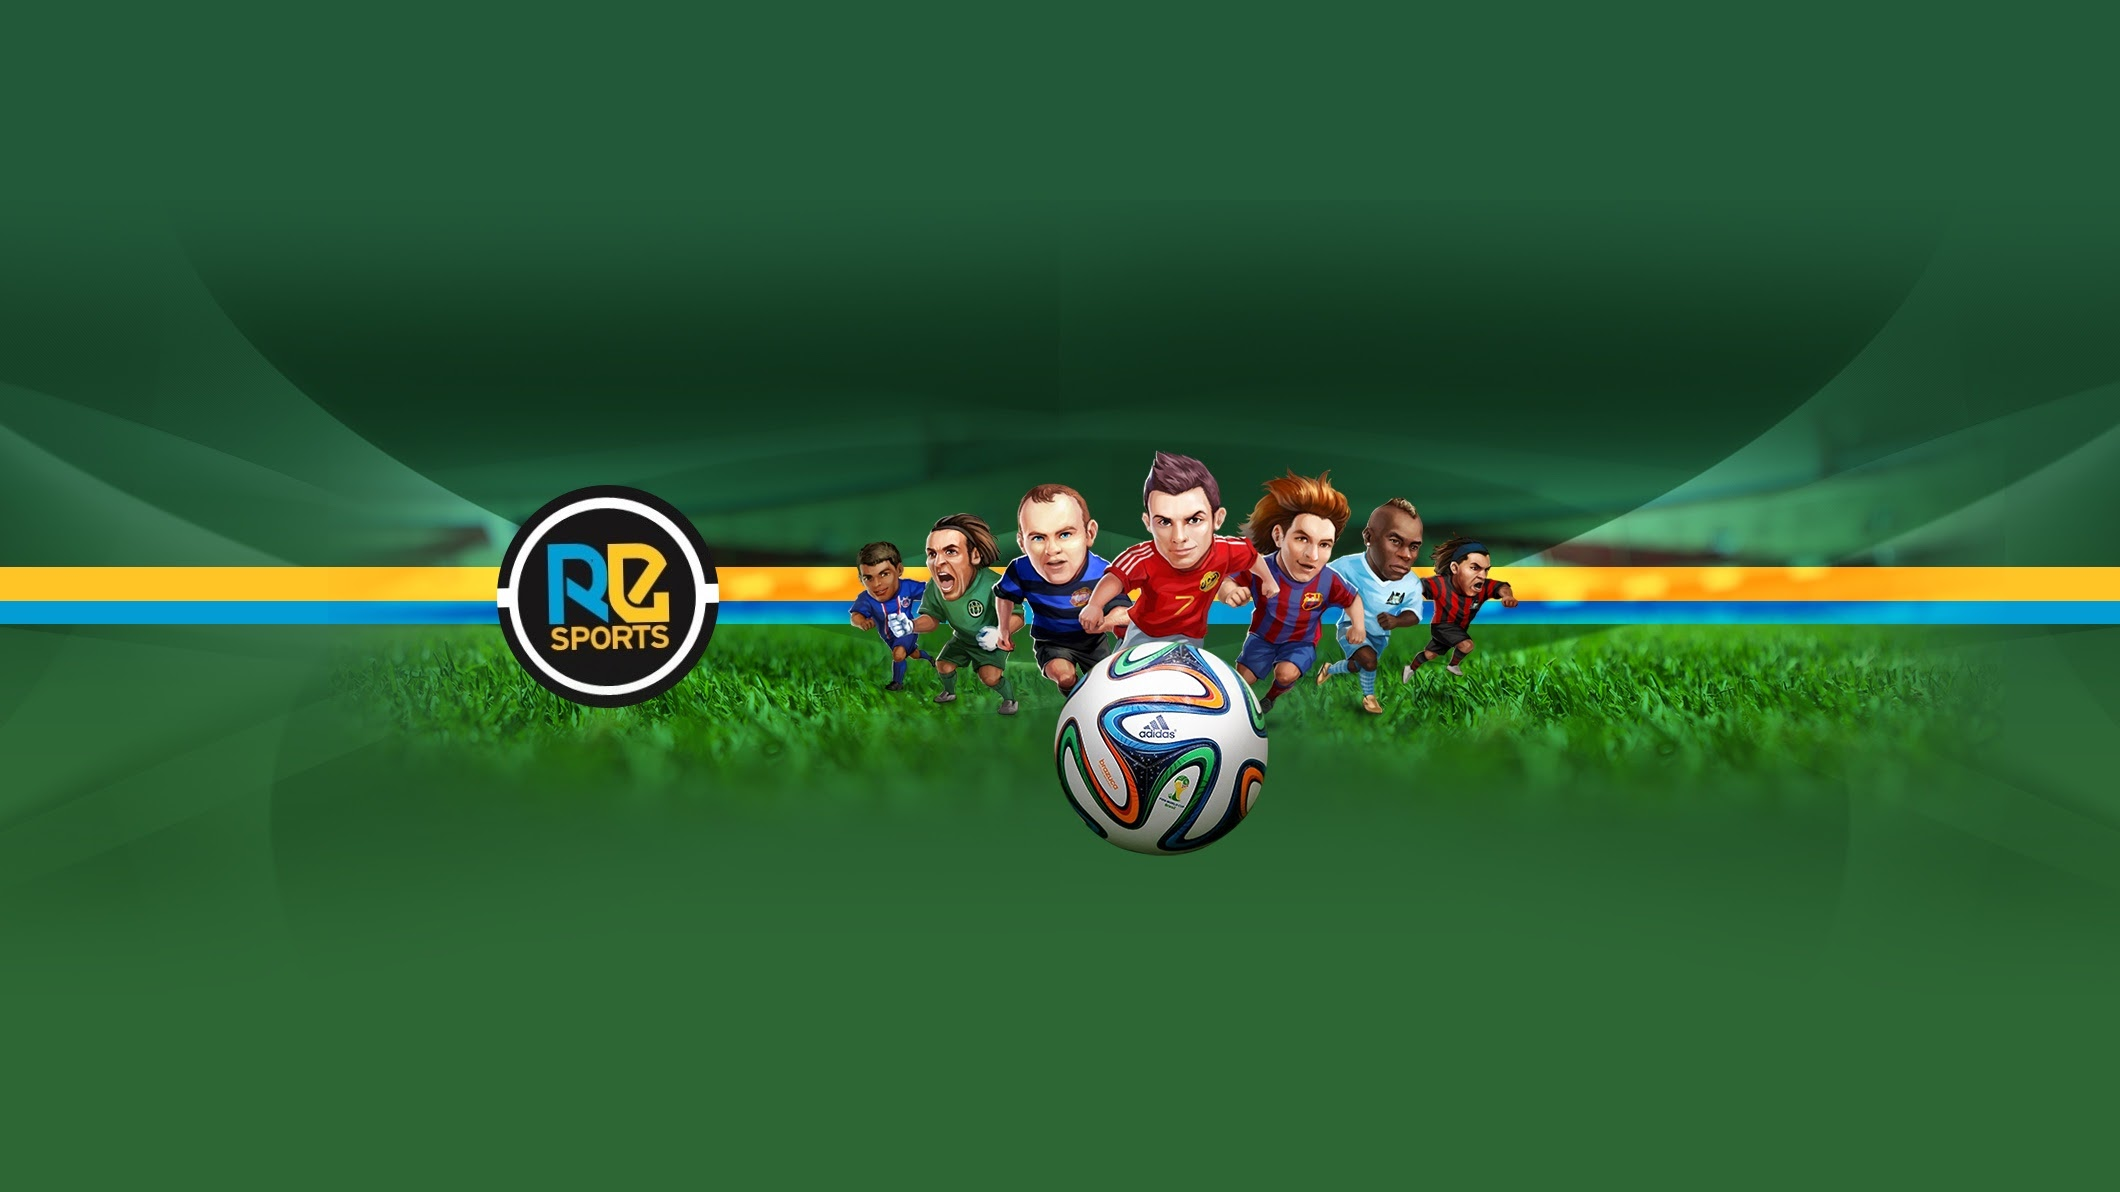 Re Sports Inc